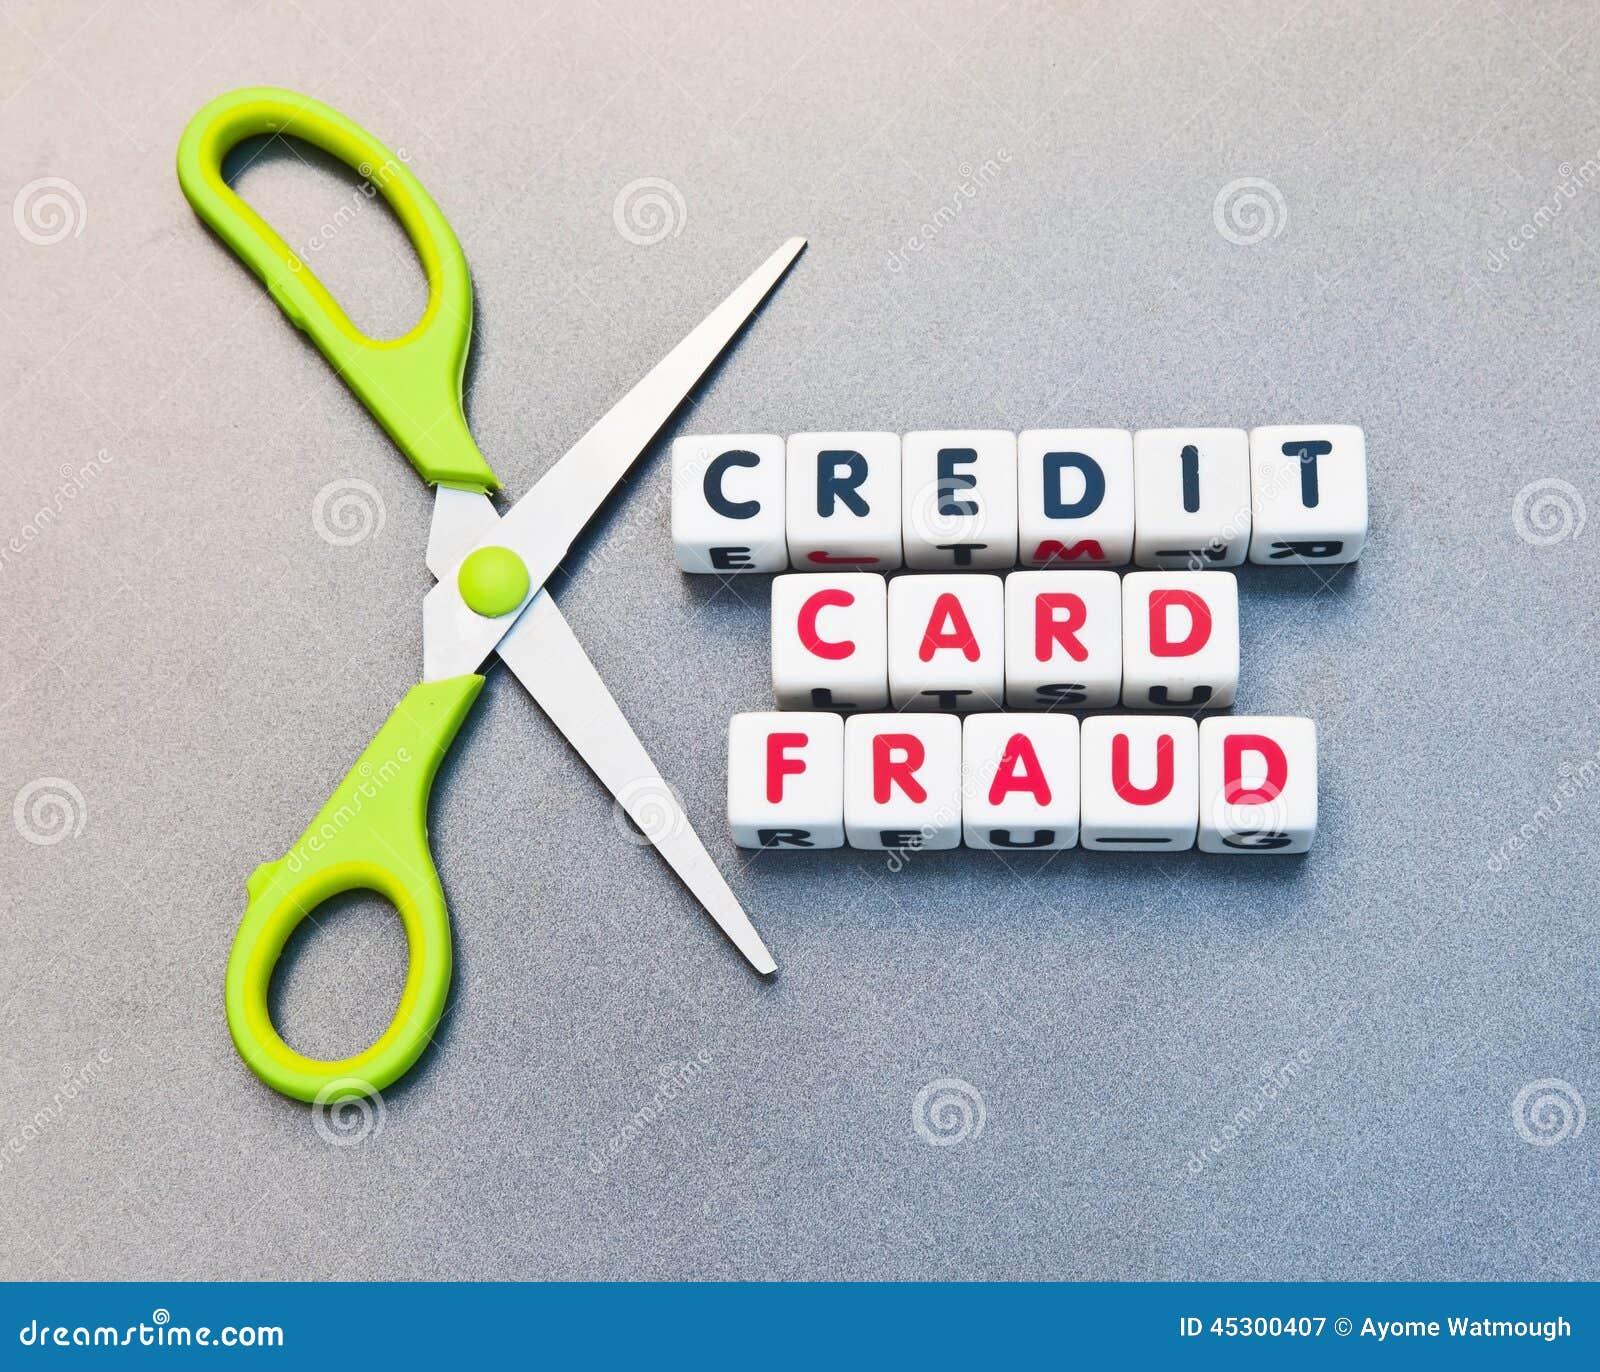 Credit Card Fraud Stock Photo Image 45300407